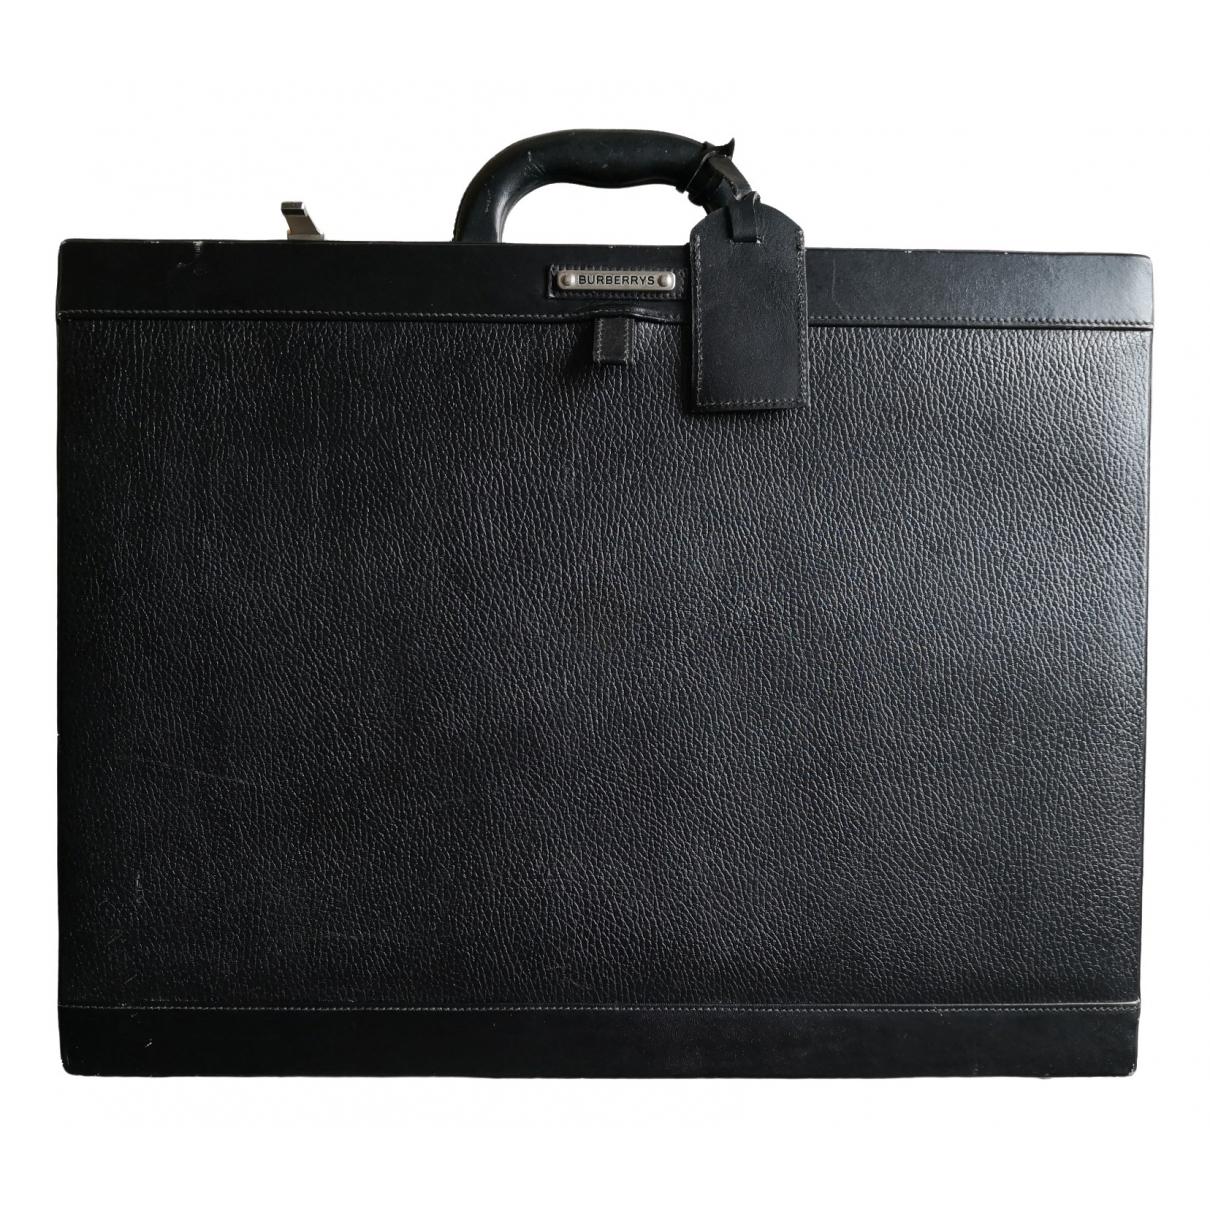 Burberry \N Black Leather bag for Men \N